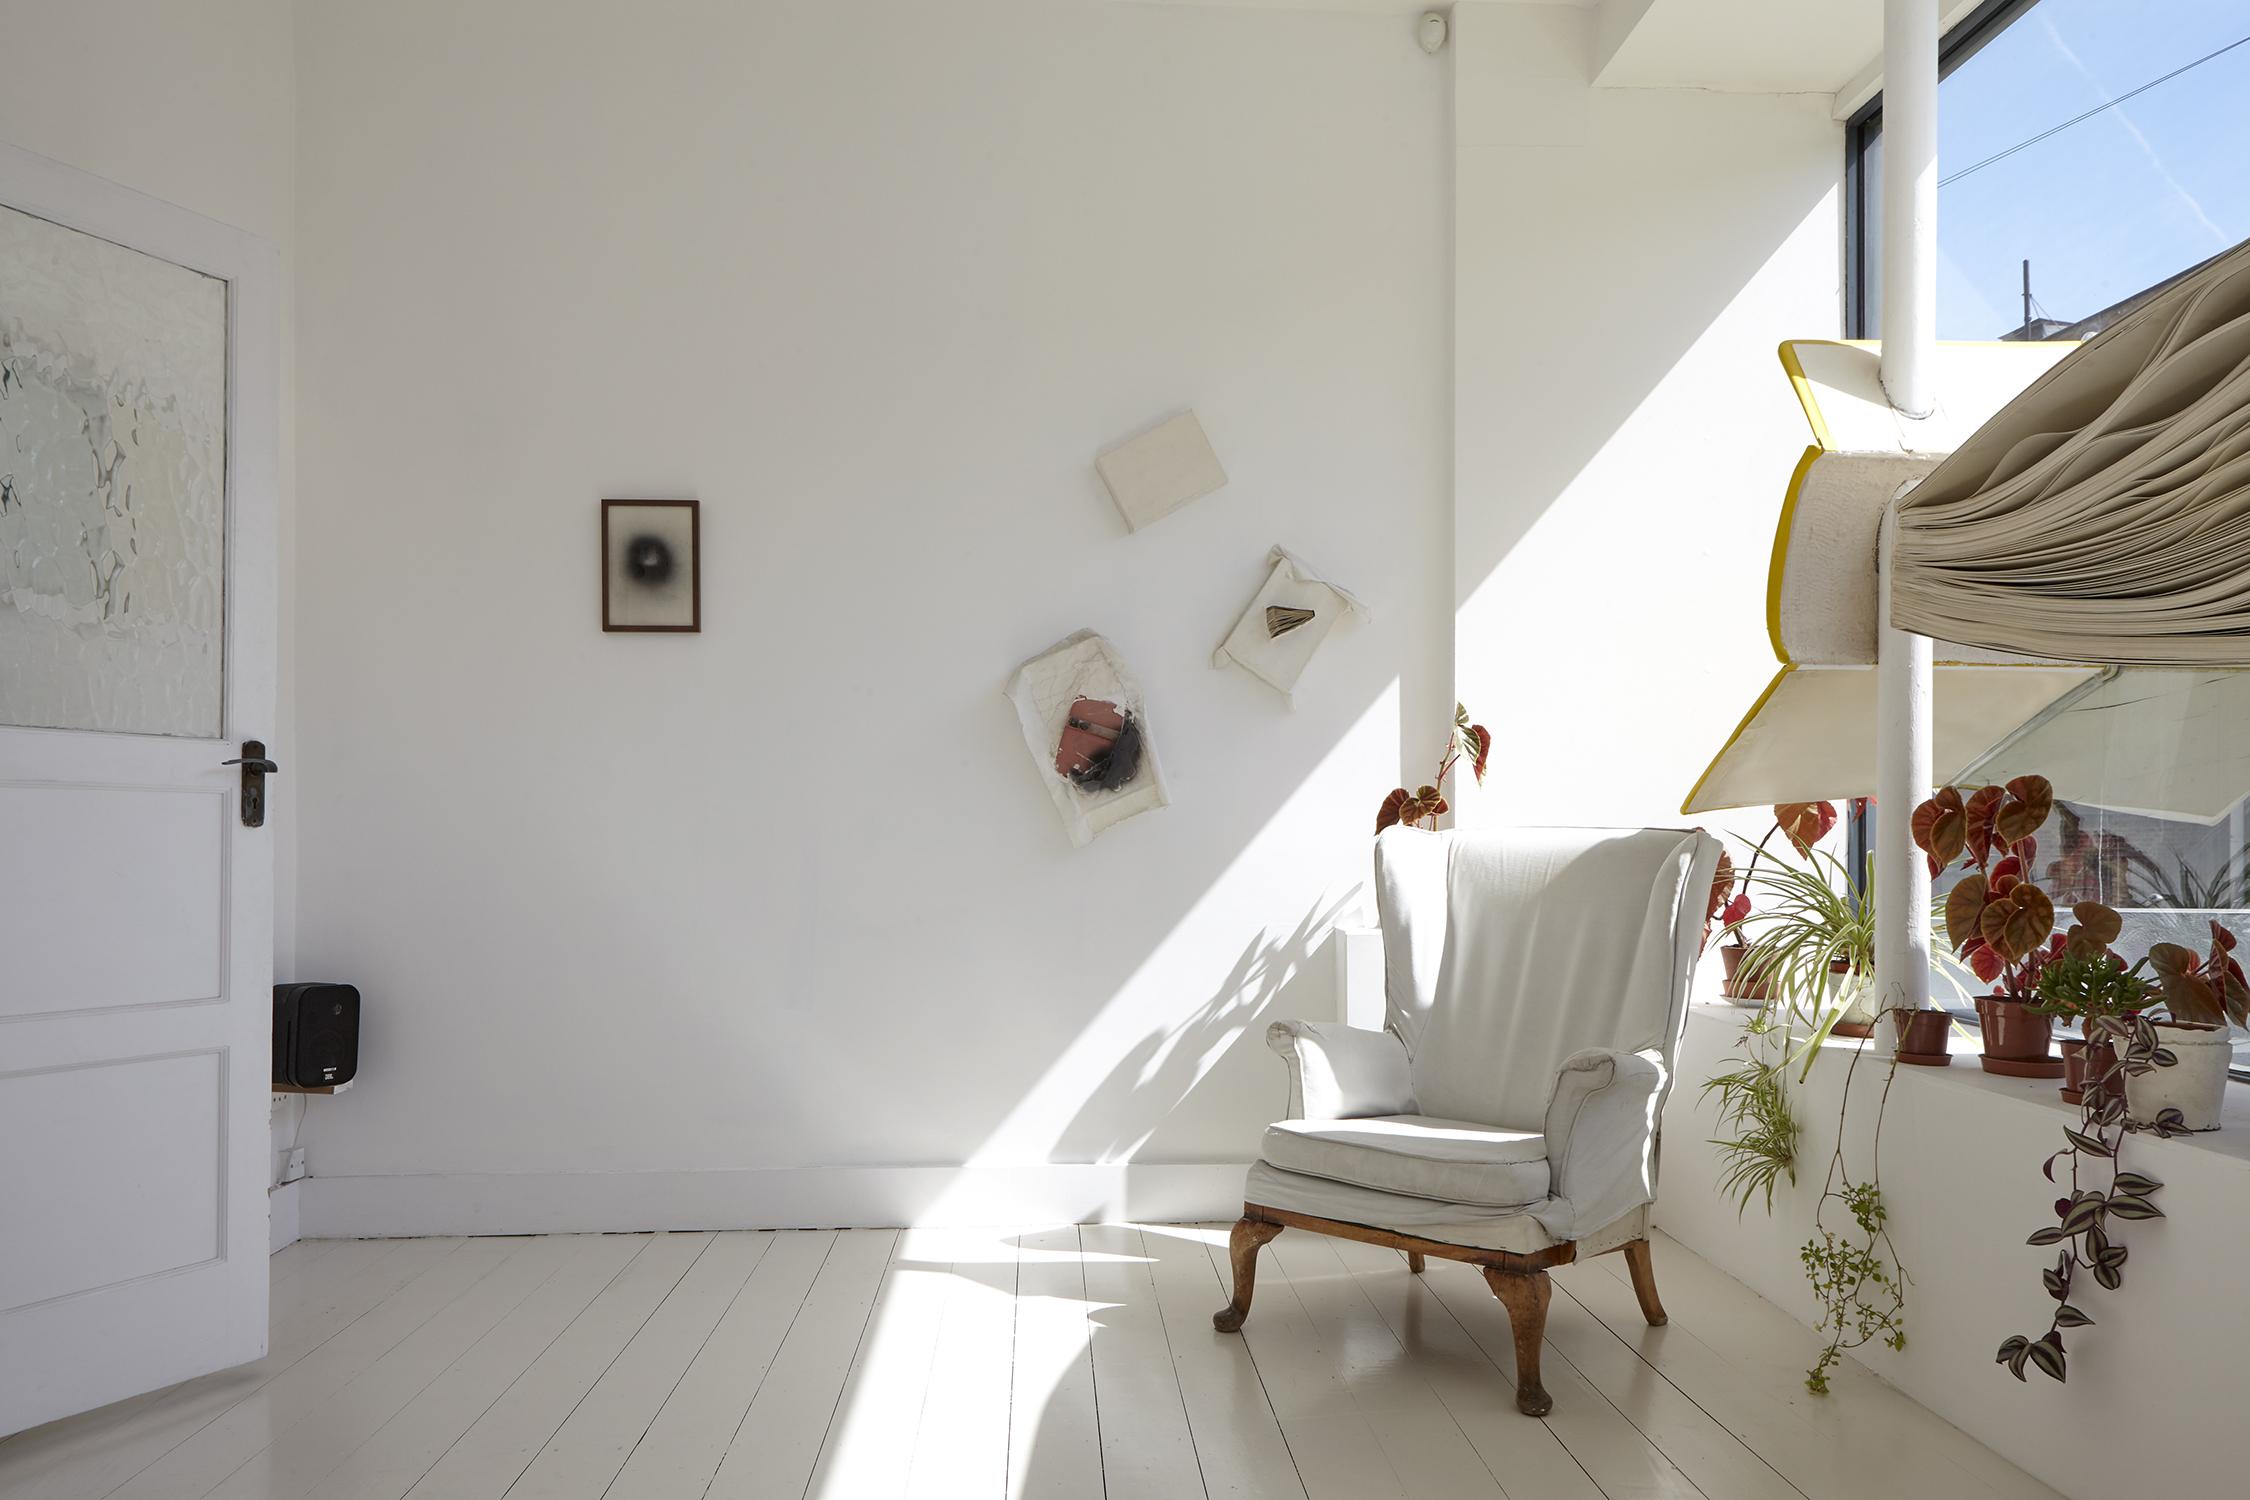 Living Sculpture, installation view. Photograph: Jean-Philippe Woodland (Living Sculpture 6)